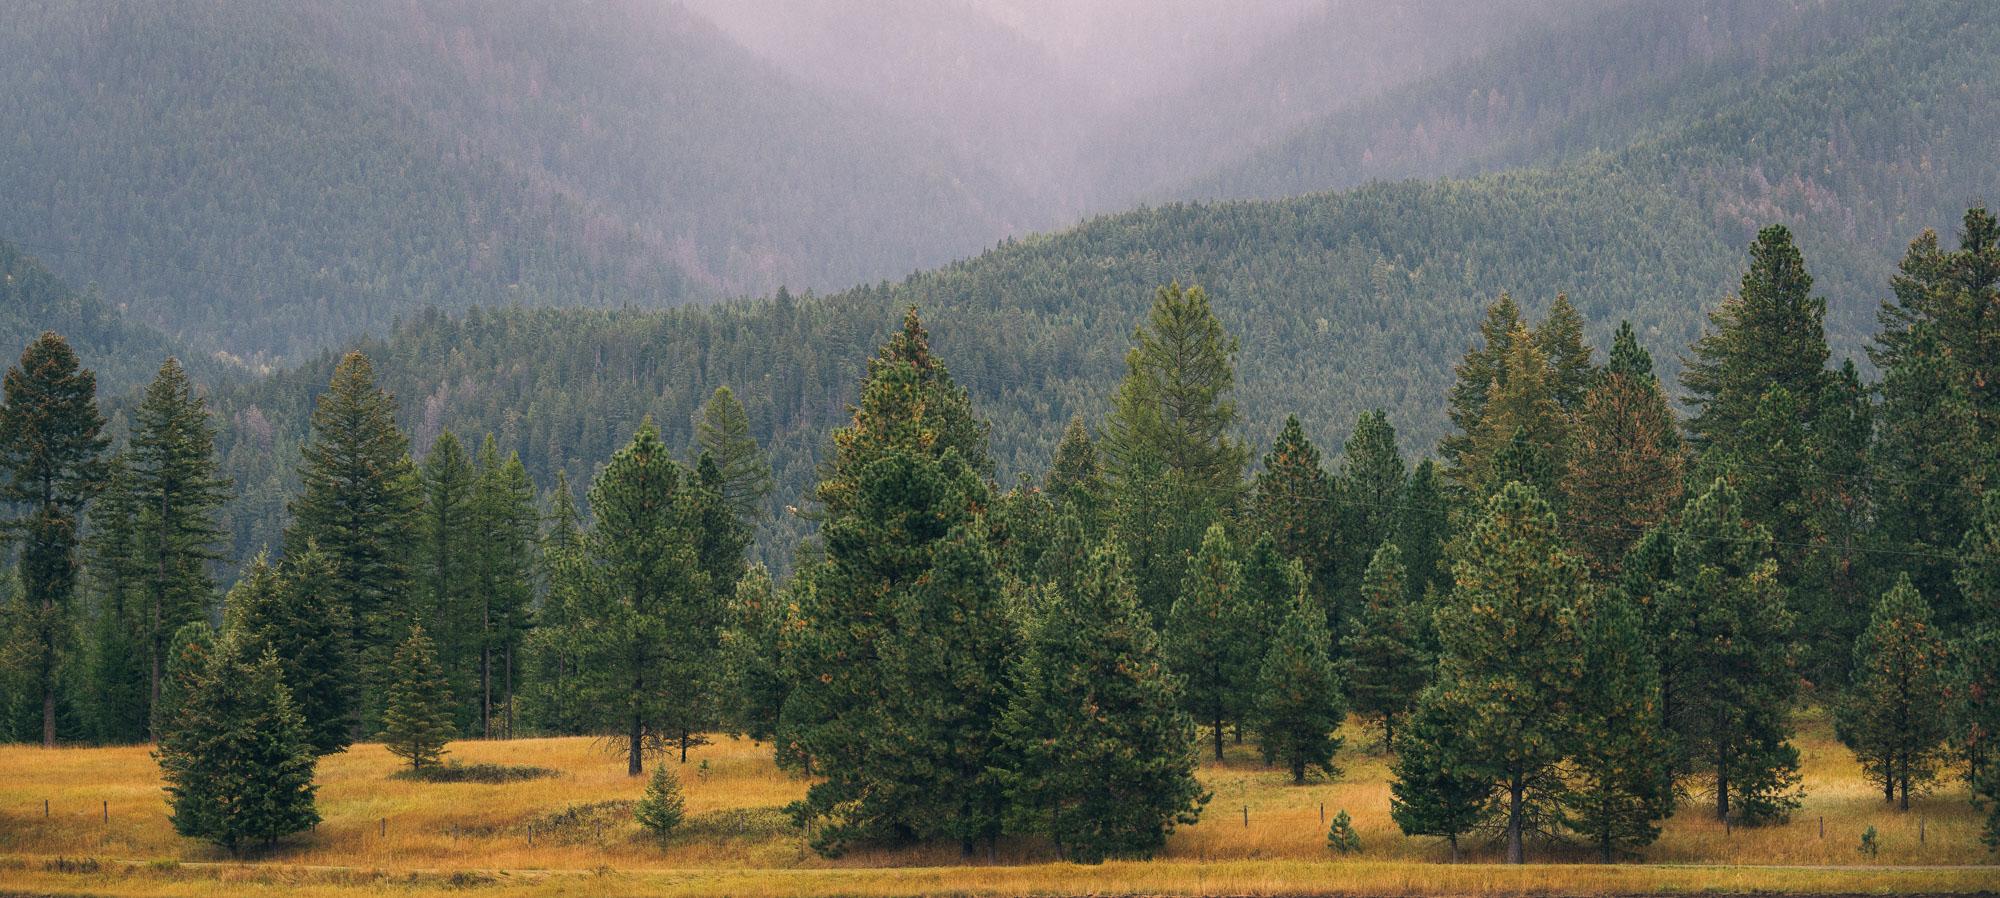 Great Divide Montana: Eureka – Helena